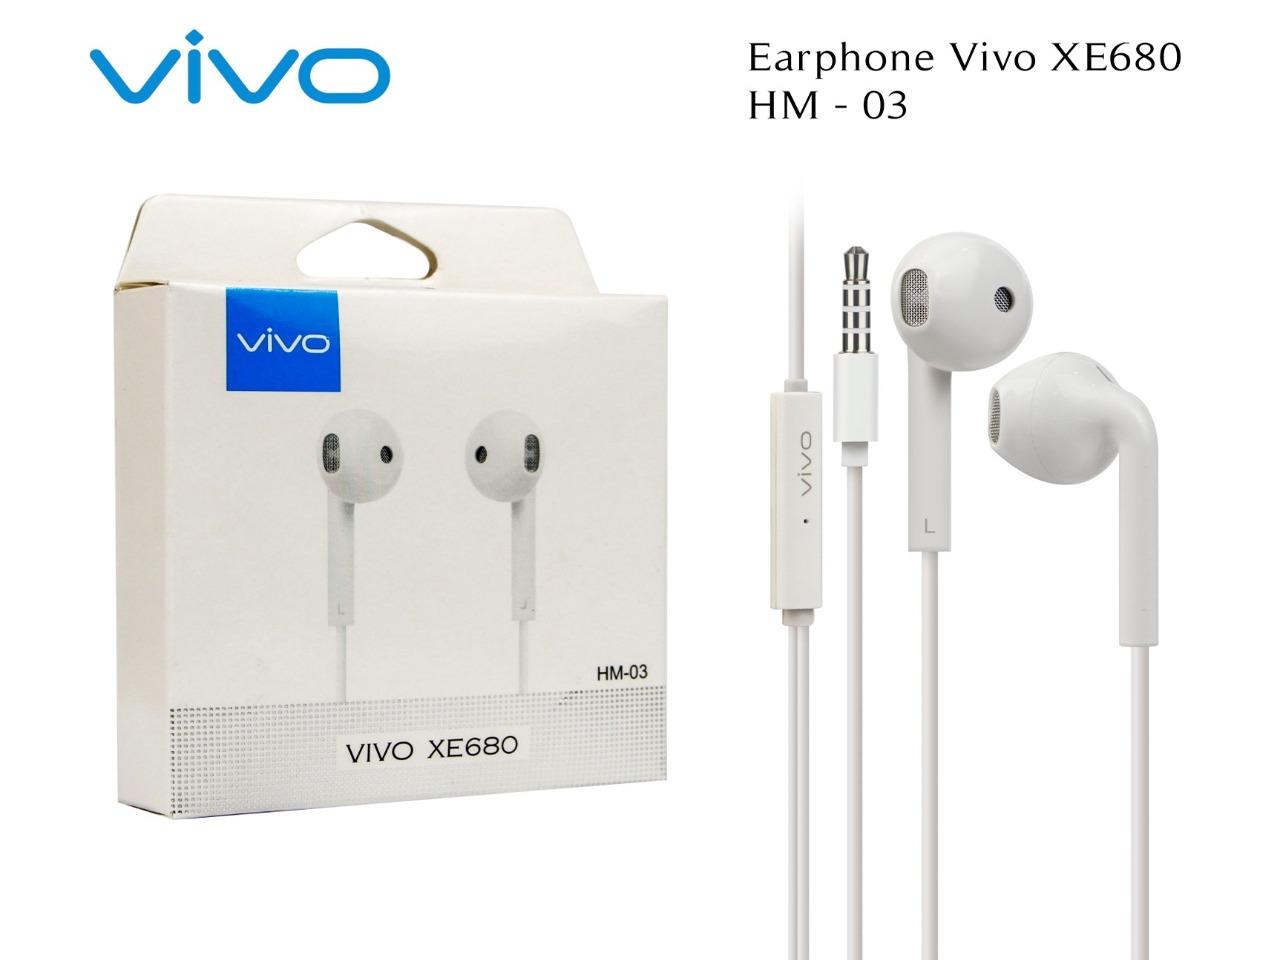 HANDSFREE-VIVO-XE-680-HM-03